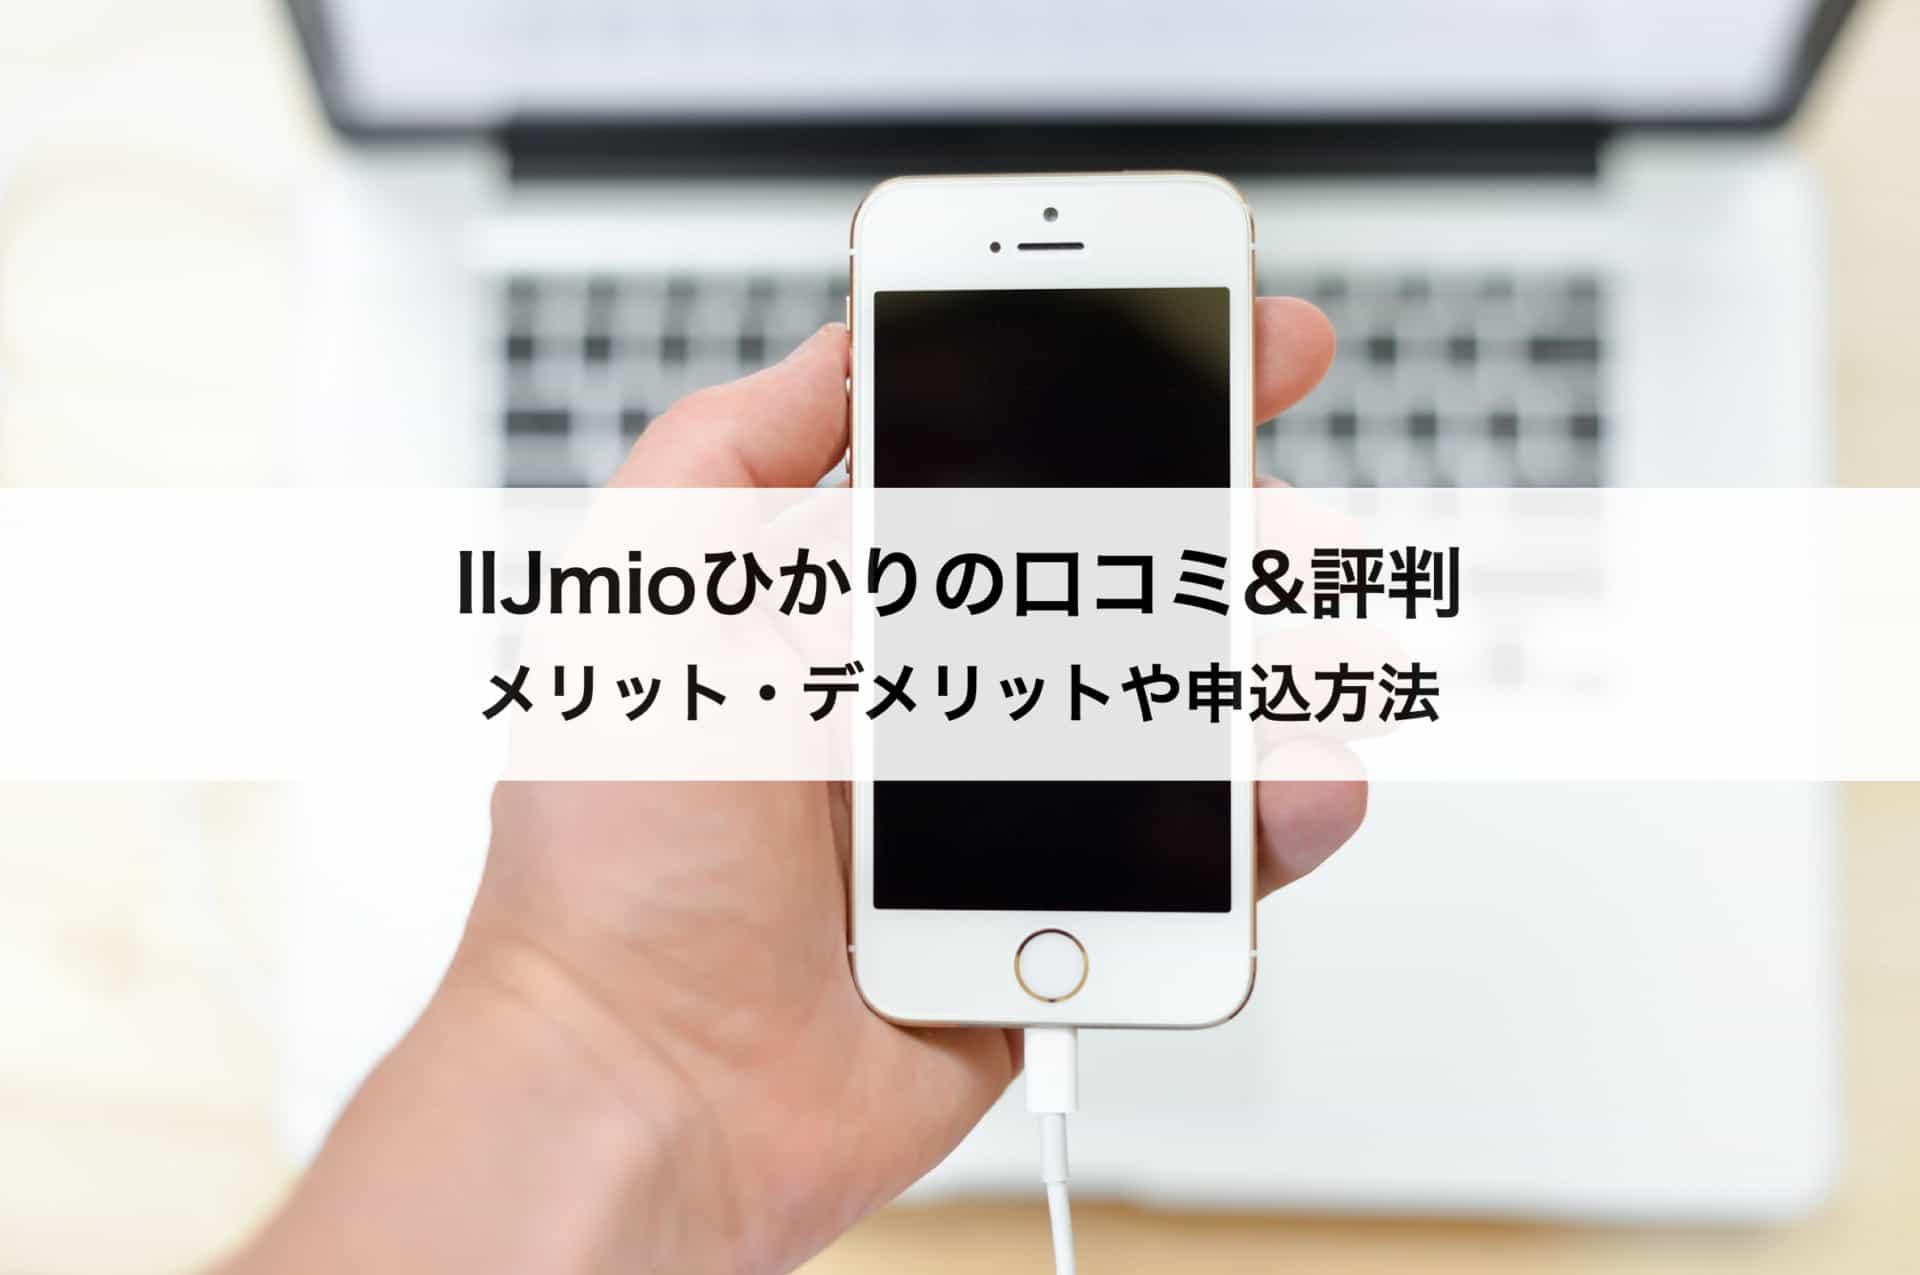 IIJmioひかりの口コミ&評判 メリット・デメリットや申込方法まで徹底解説!